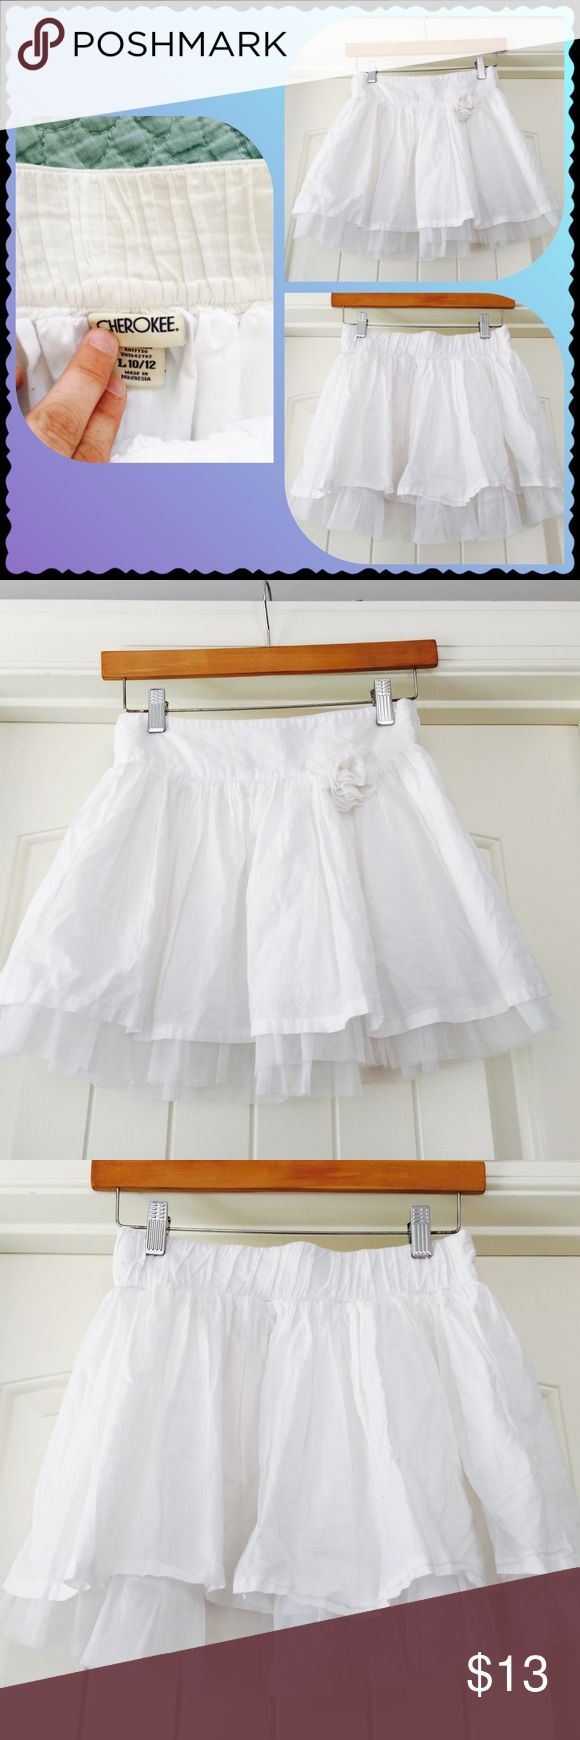 Cherokee girls linen and lace skirt Cherokee brand girls linen and lace skirt. Perfect white condition. Cherokee Bottoms Skirts